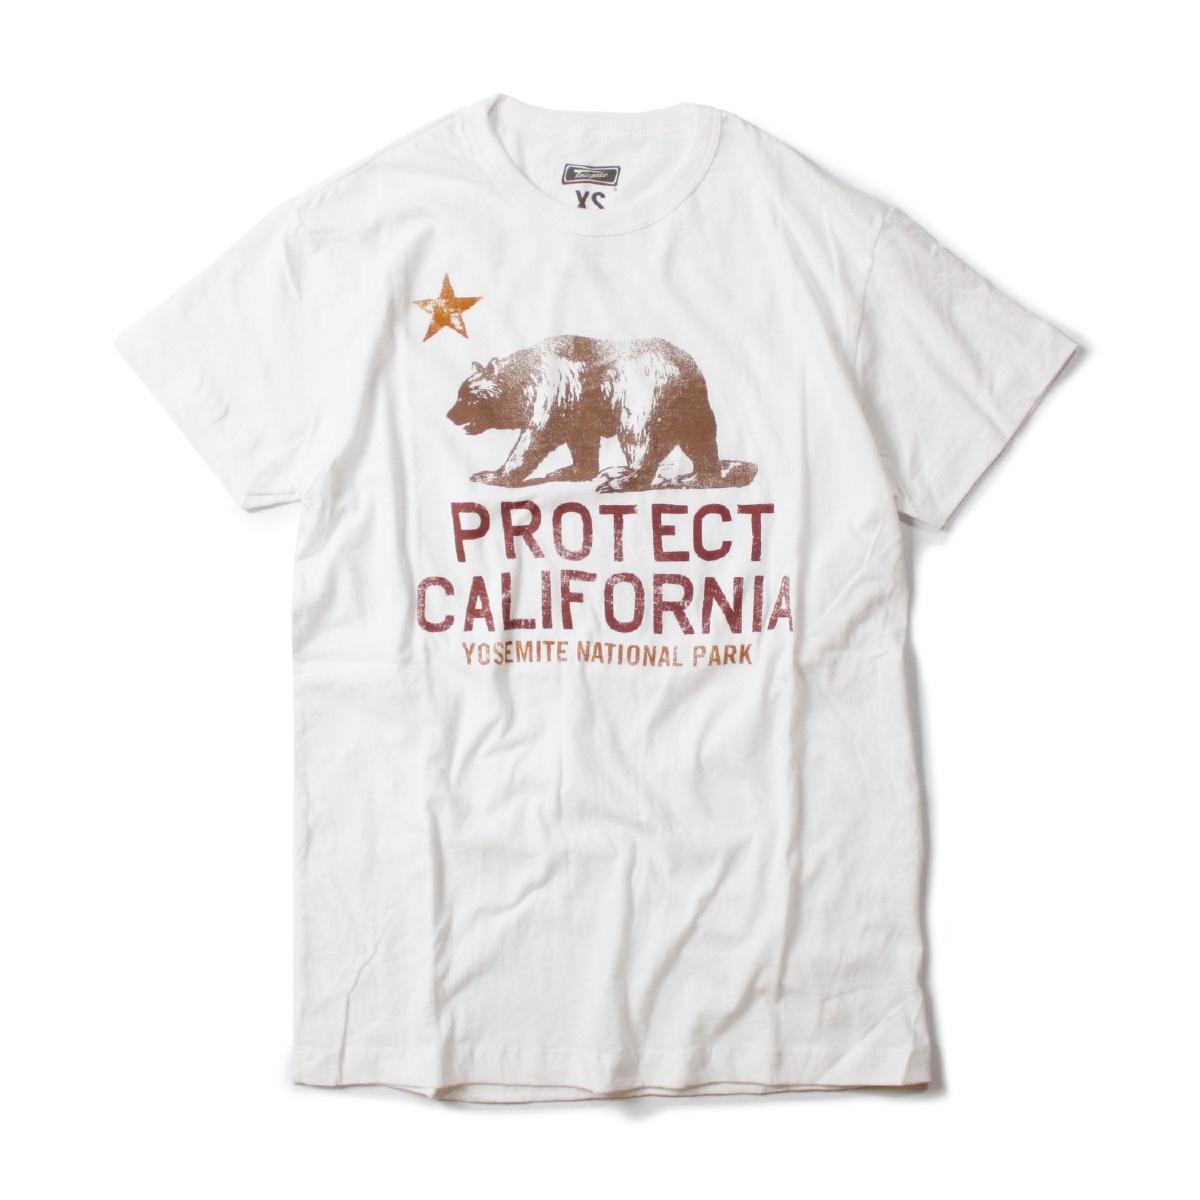 TAILGATE テイルゲート PROTECT CALIFORNIA Tシャツ